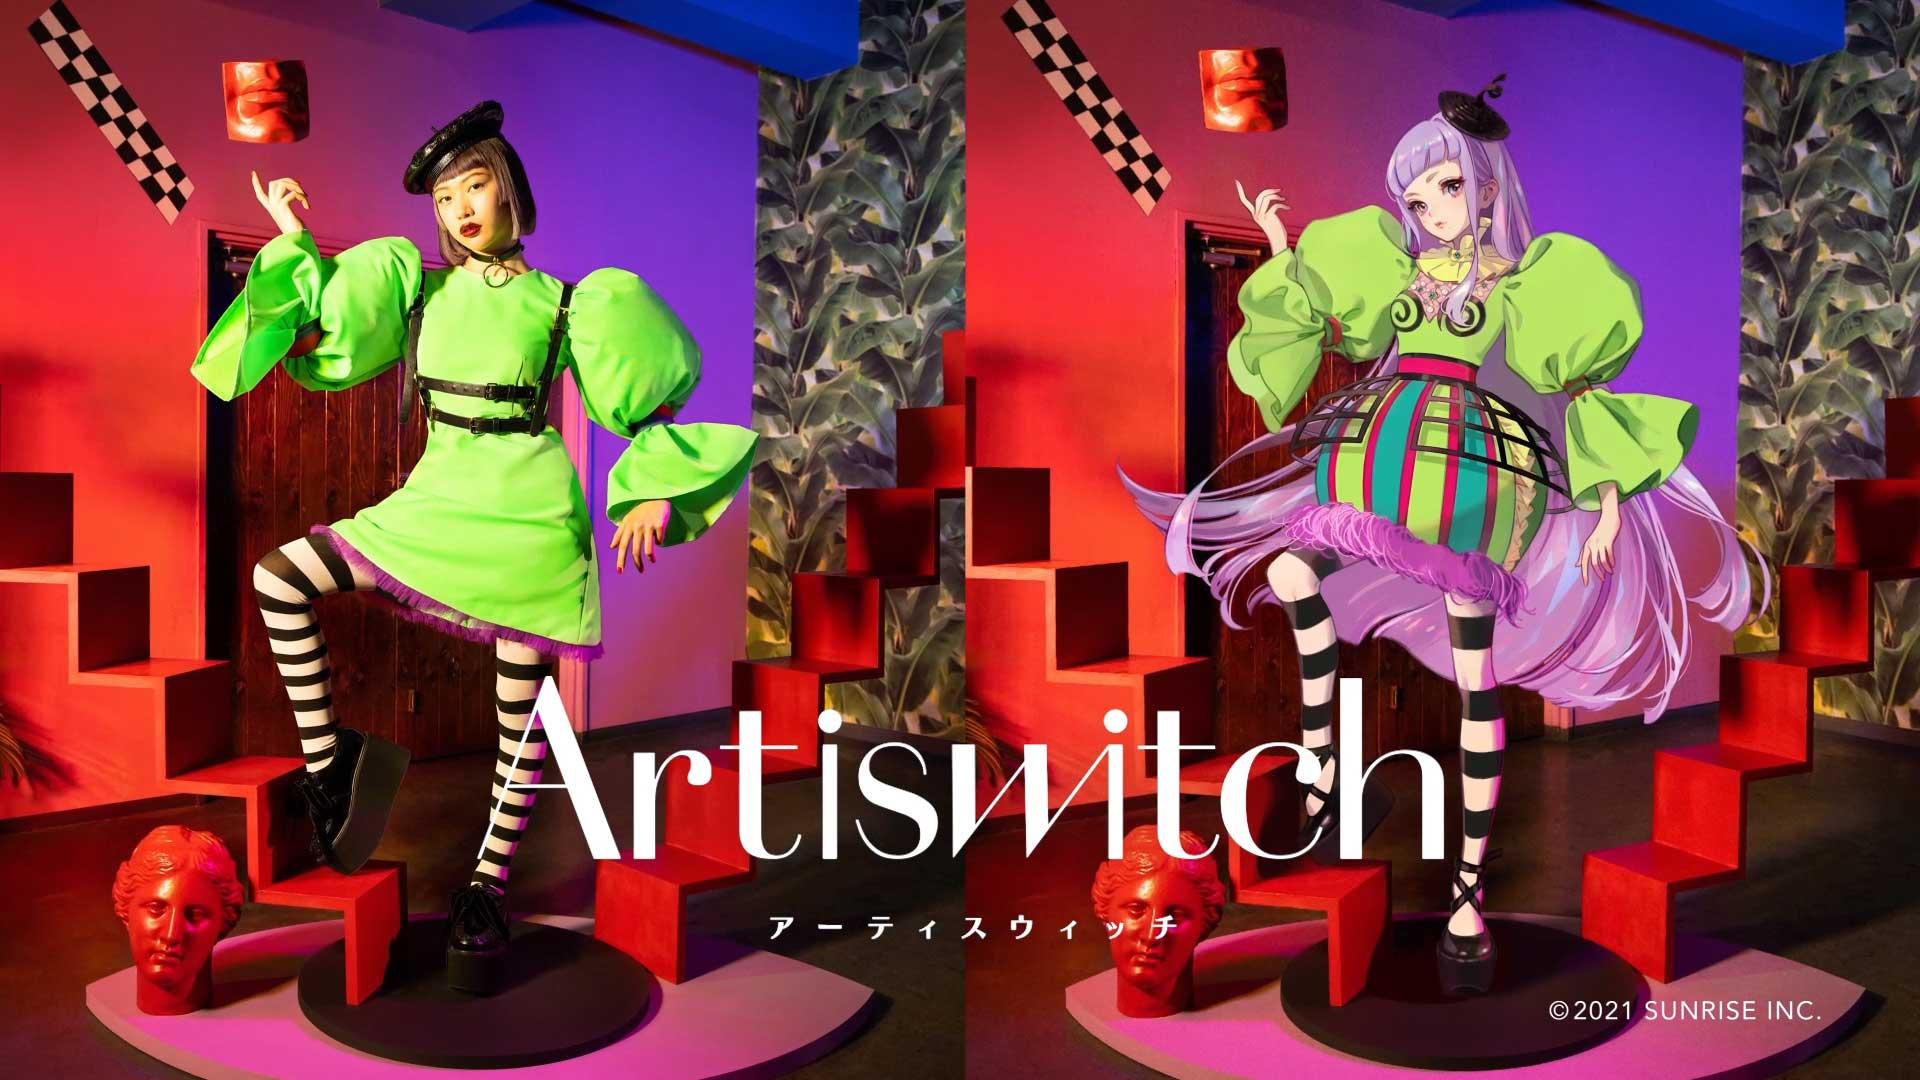 『Artiswitch(アーティスウィッチ)』ティザー PV